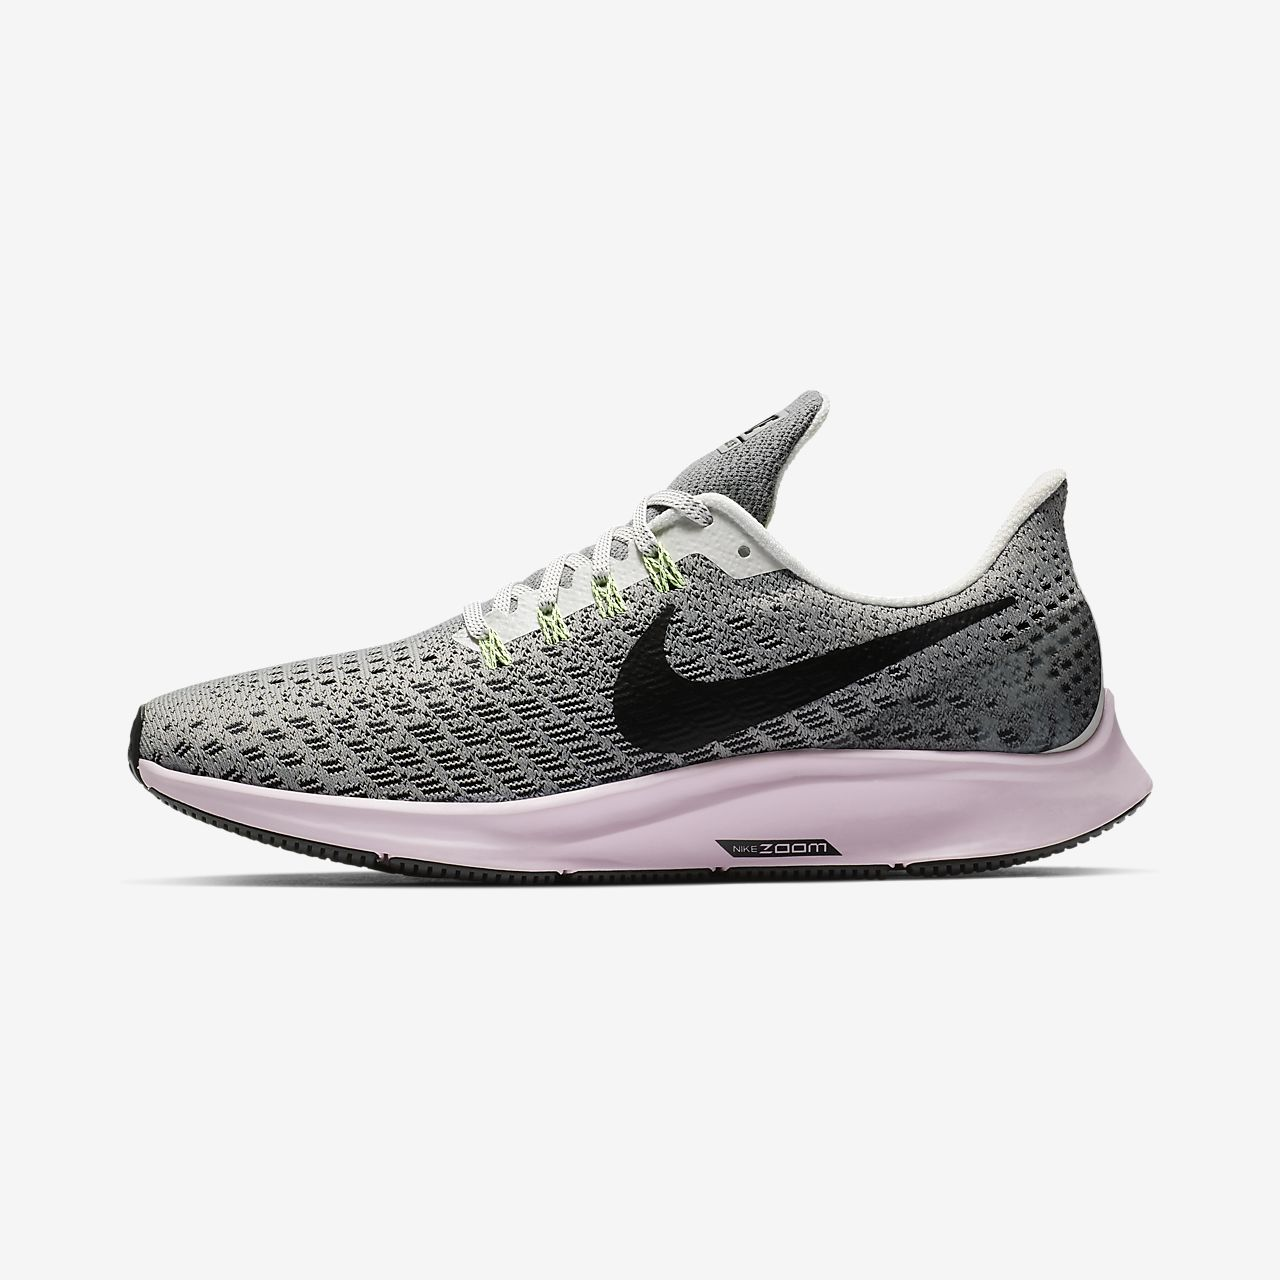 f1a5fc255 Adidasi Alergare Nike Air Zoom Pegasus 35 Dama Gri Roz Verzi Deschis Negrii